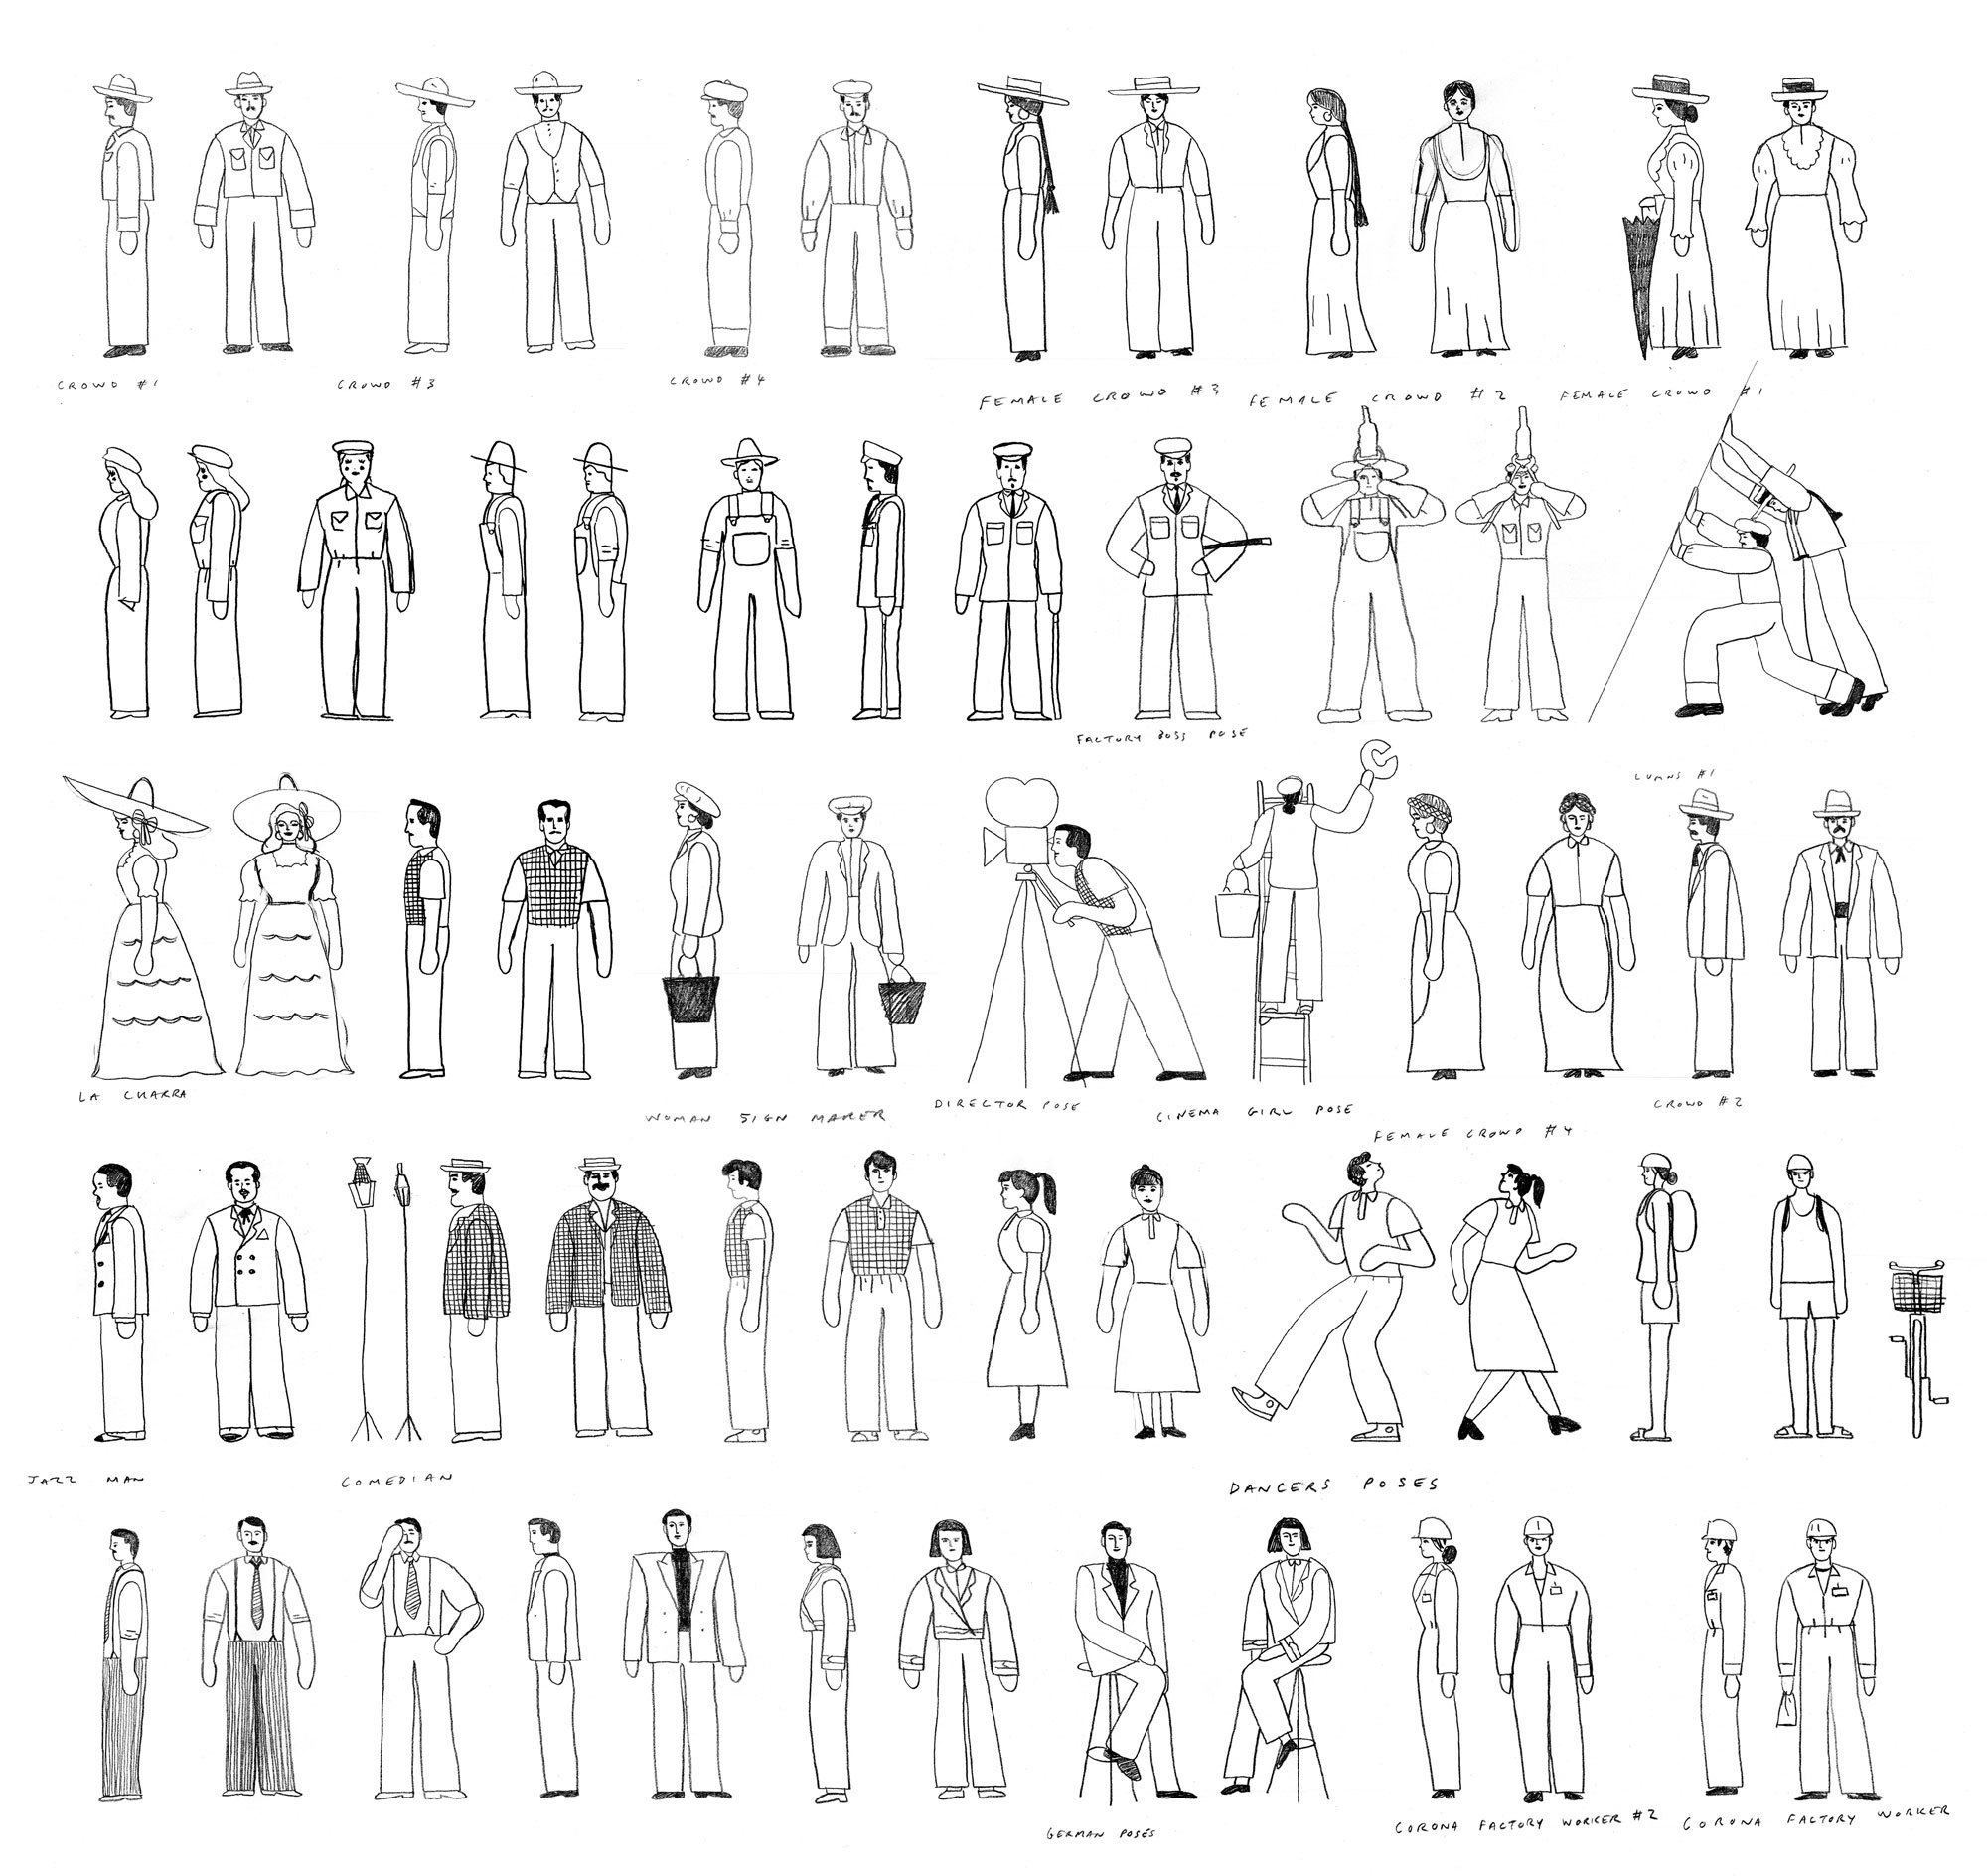 Nicolas Menard Project Corona Character Sketches